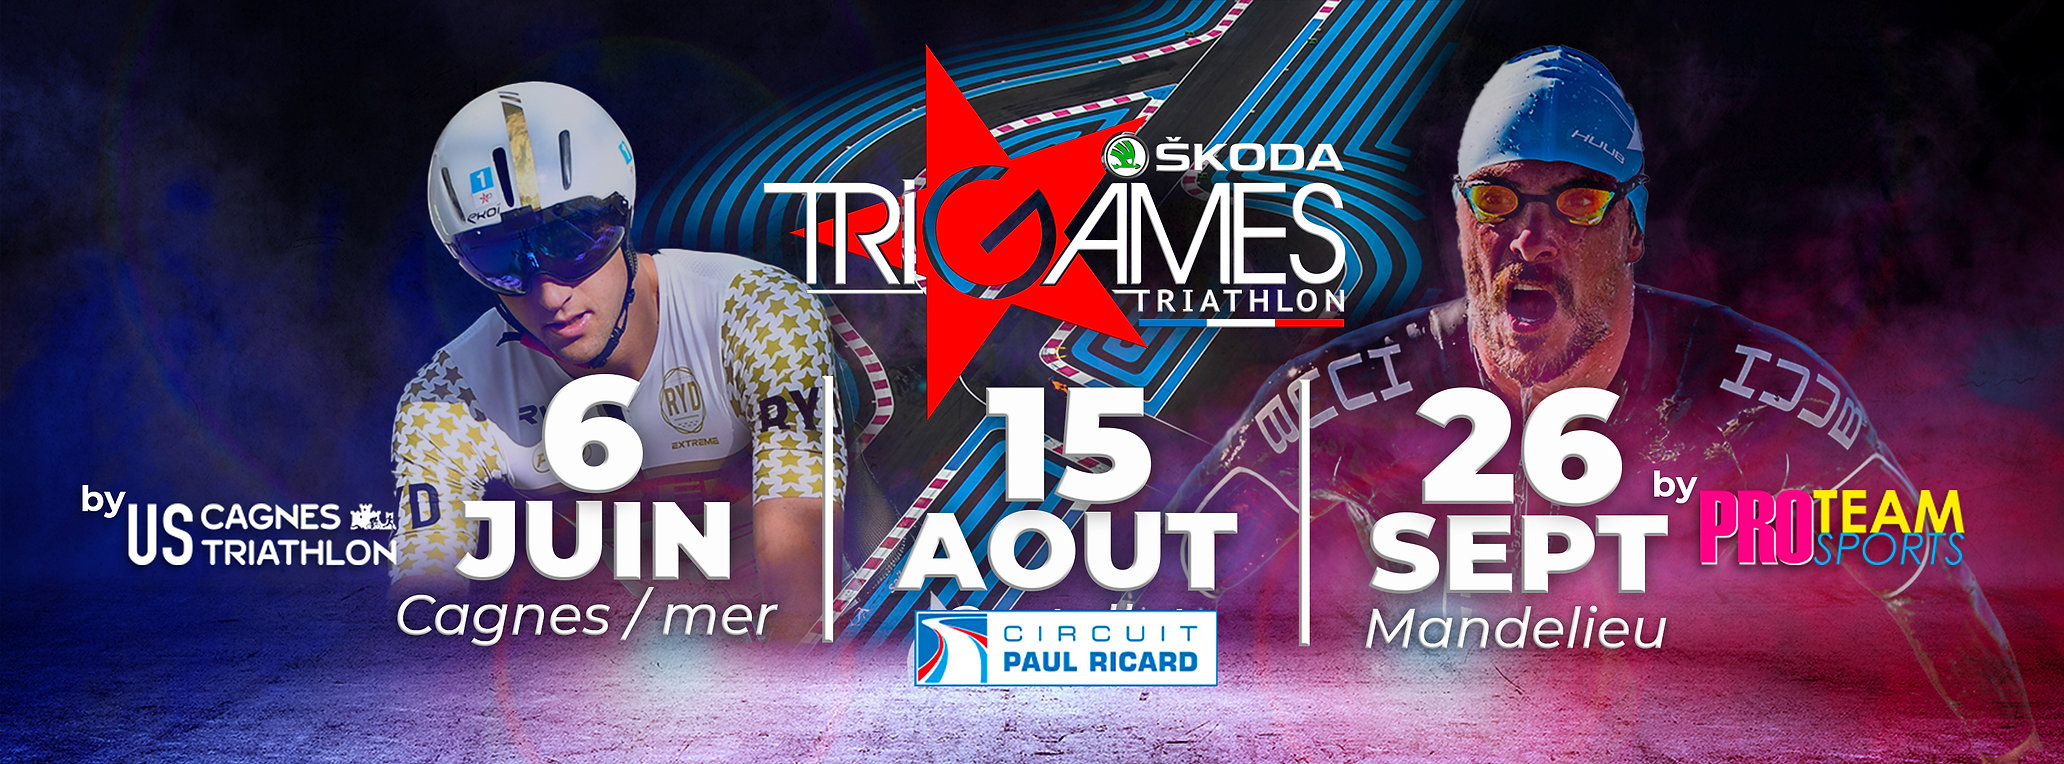 banniere Trigames FB 3dates@2x.jpg